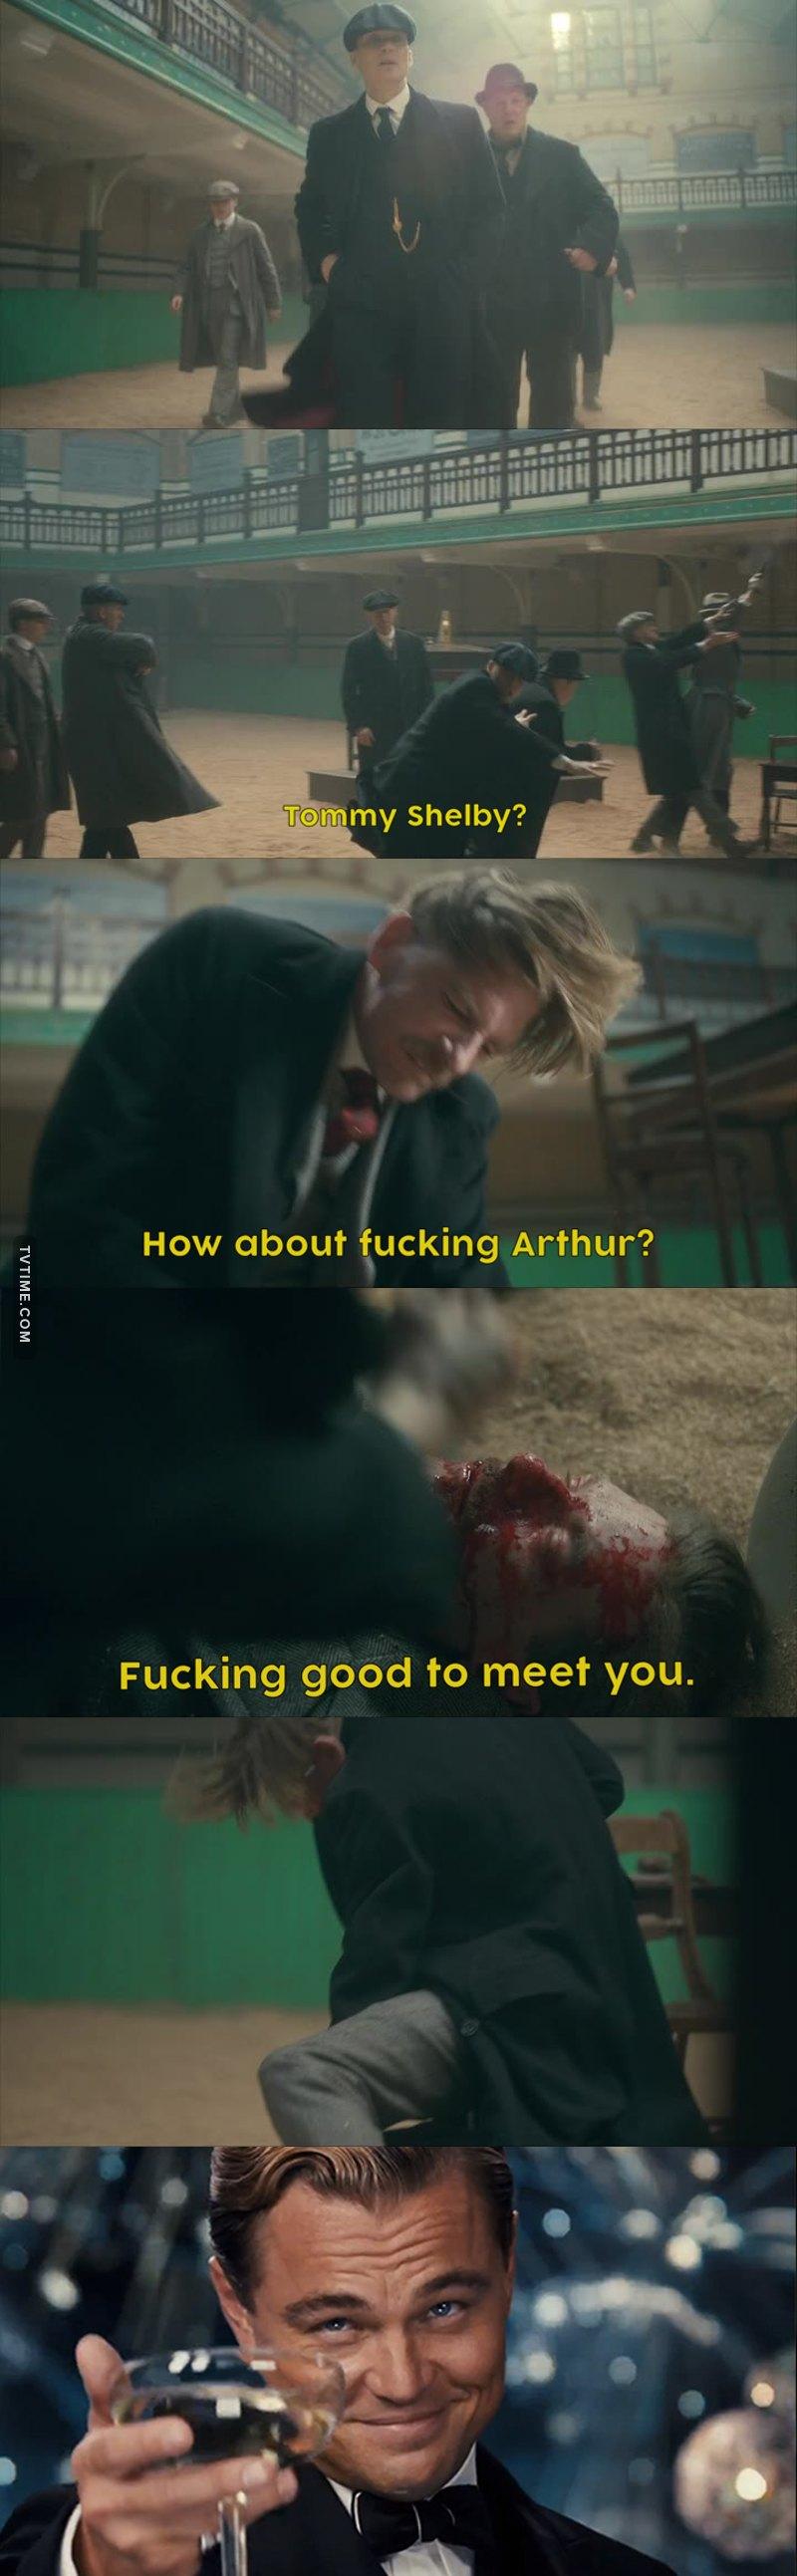 Good work Arthur 😂😂😂😂